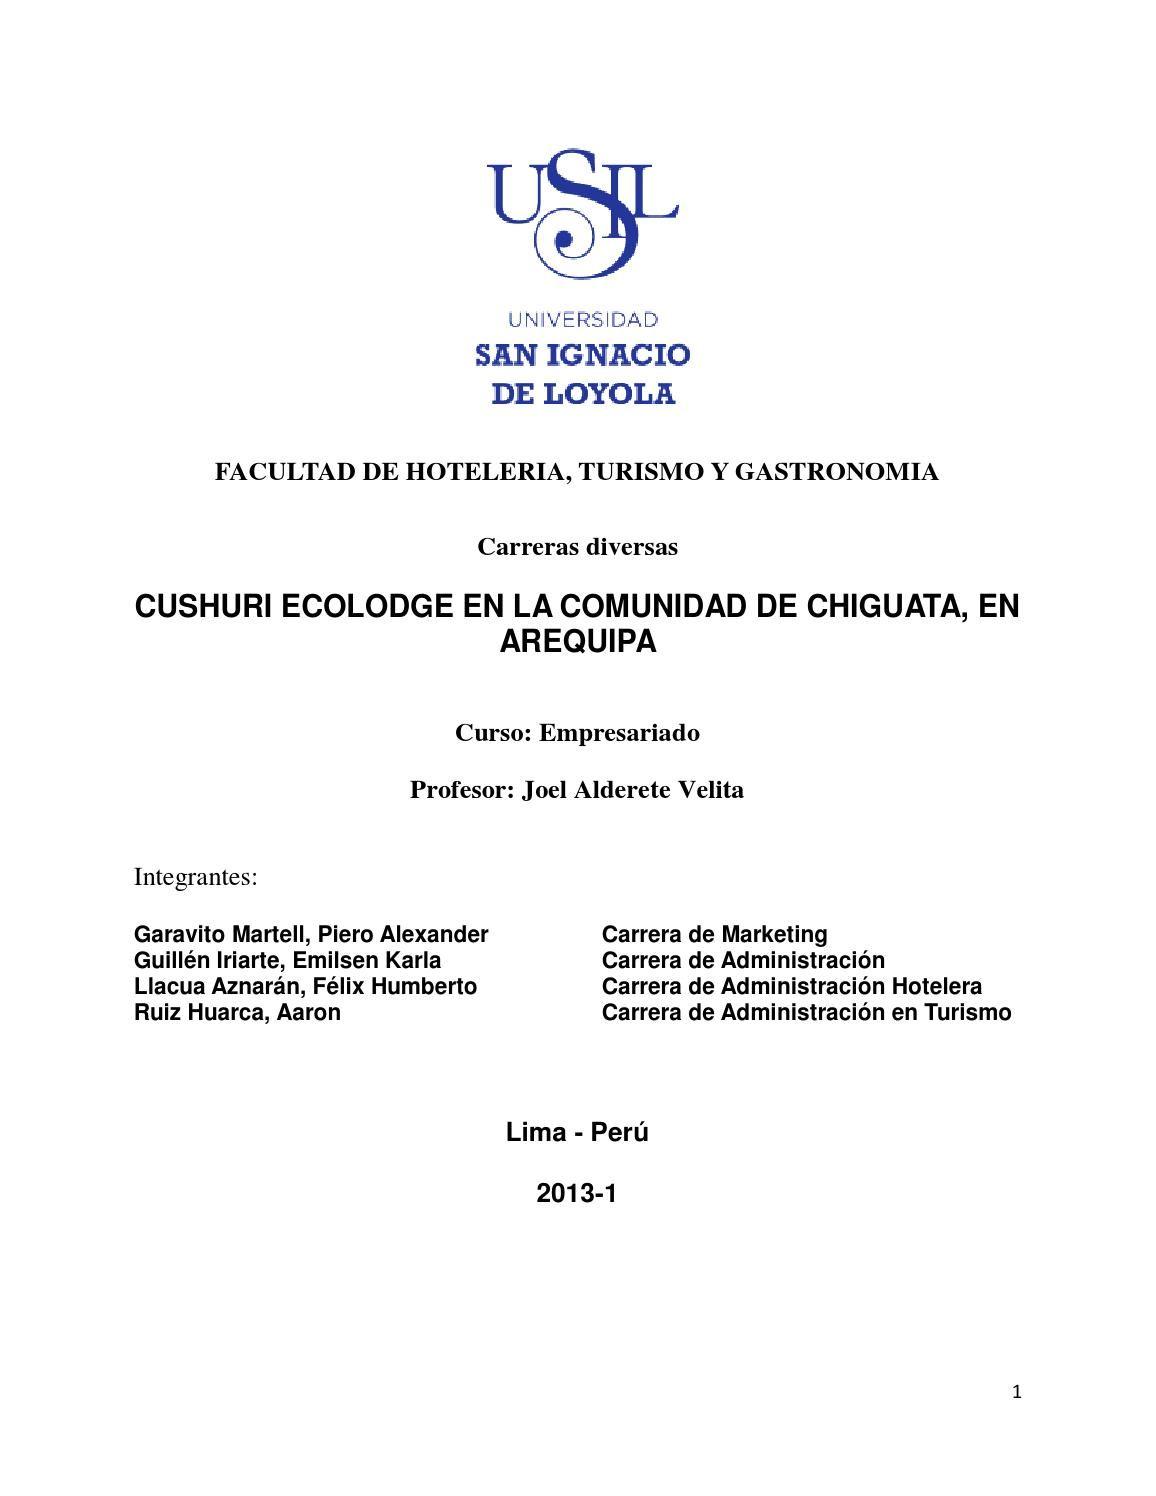 PROYECTO DE INVERSION - ECOLODGE TURISTICO EN AREQUIPA